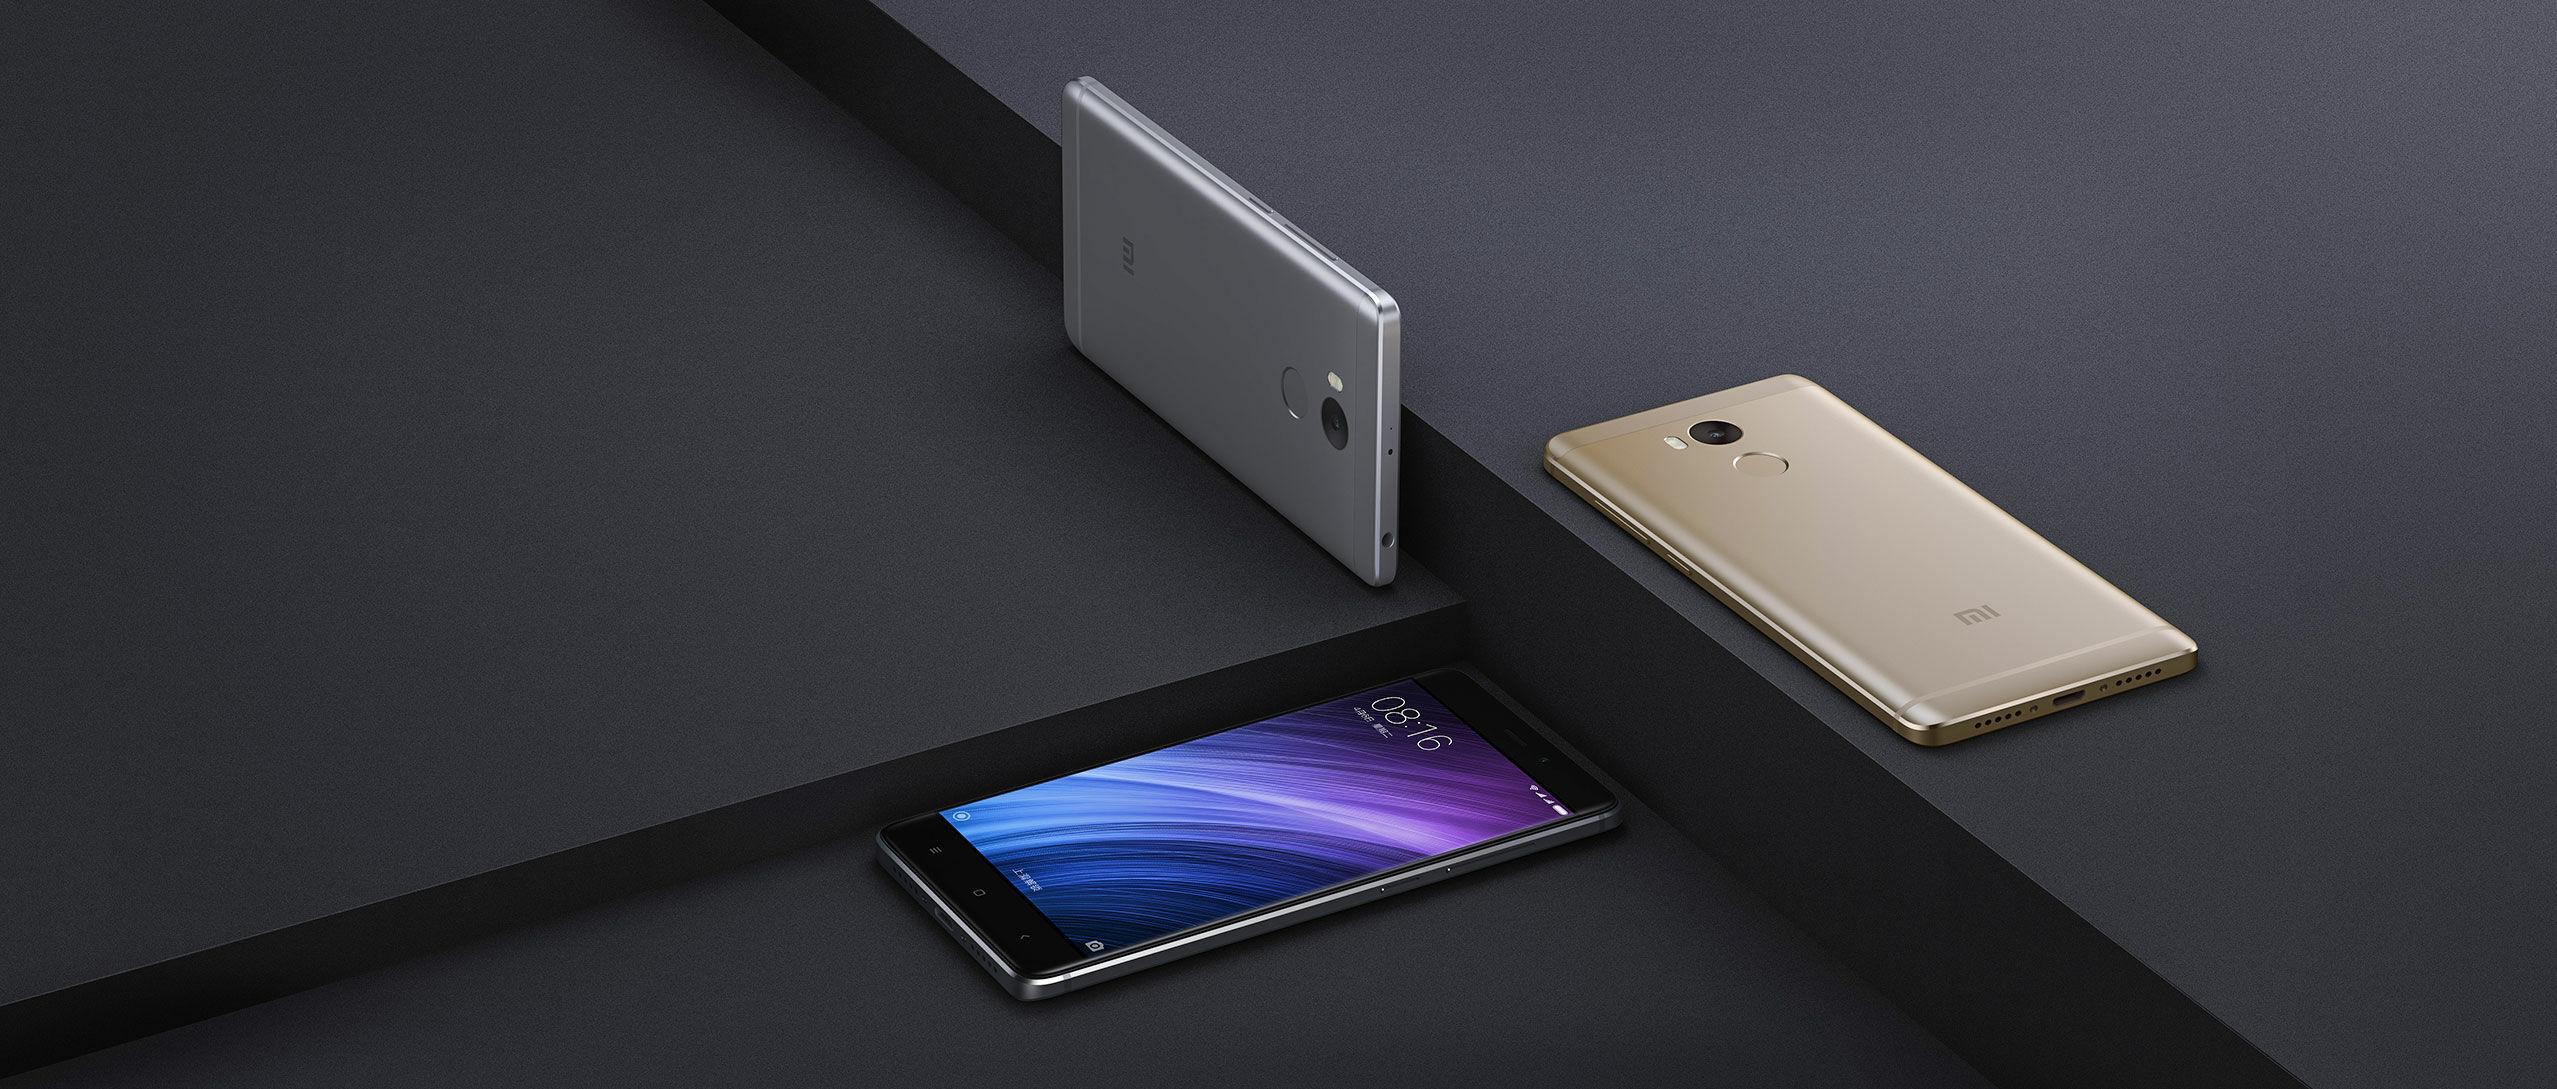 Xiaomi Redmi 4 Standar Edition